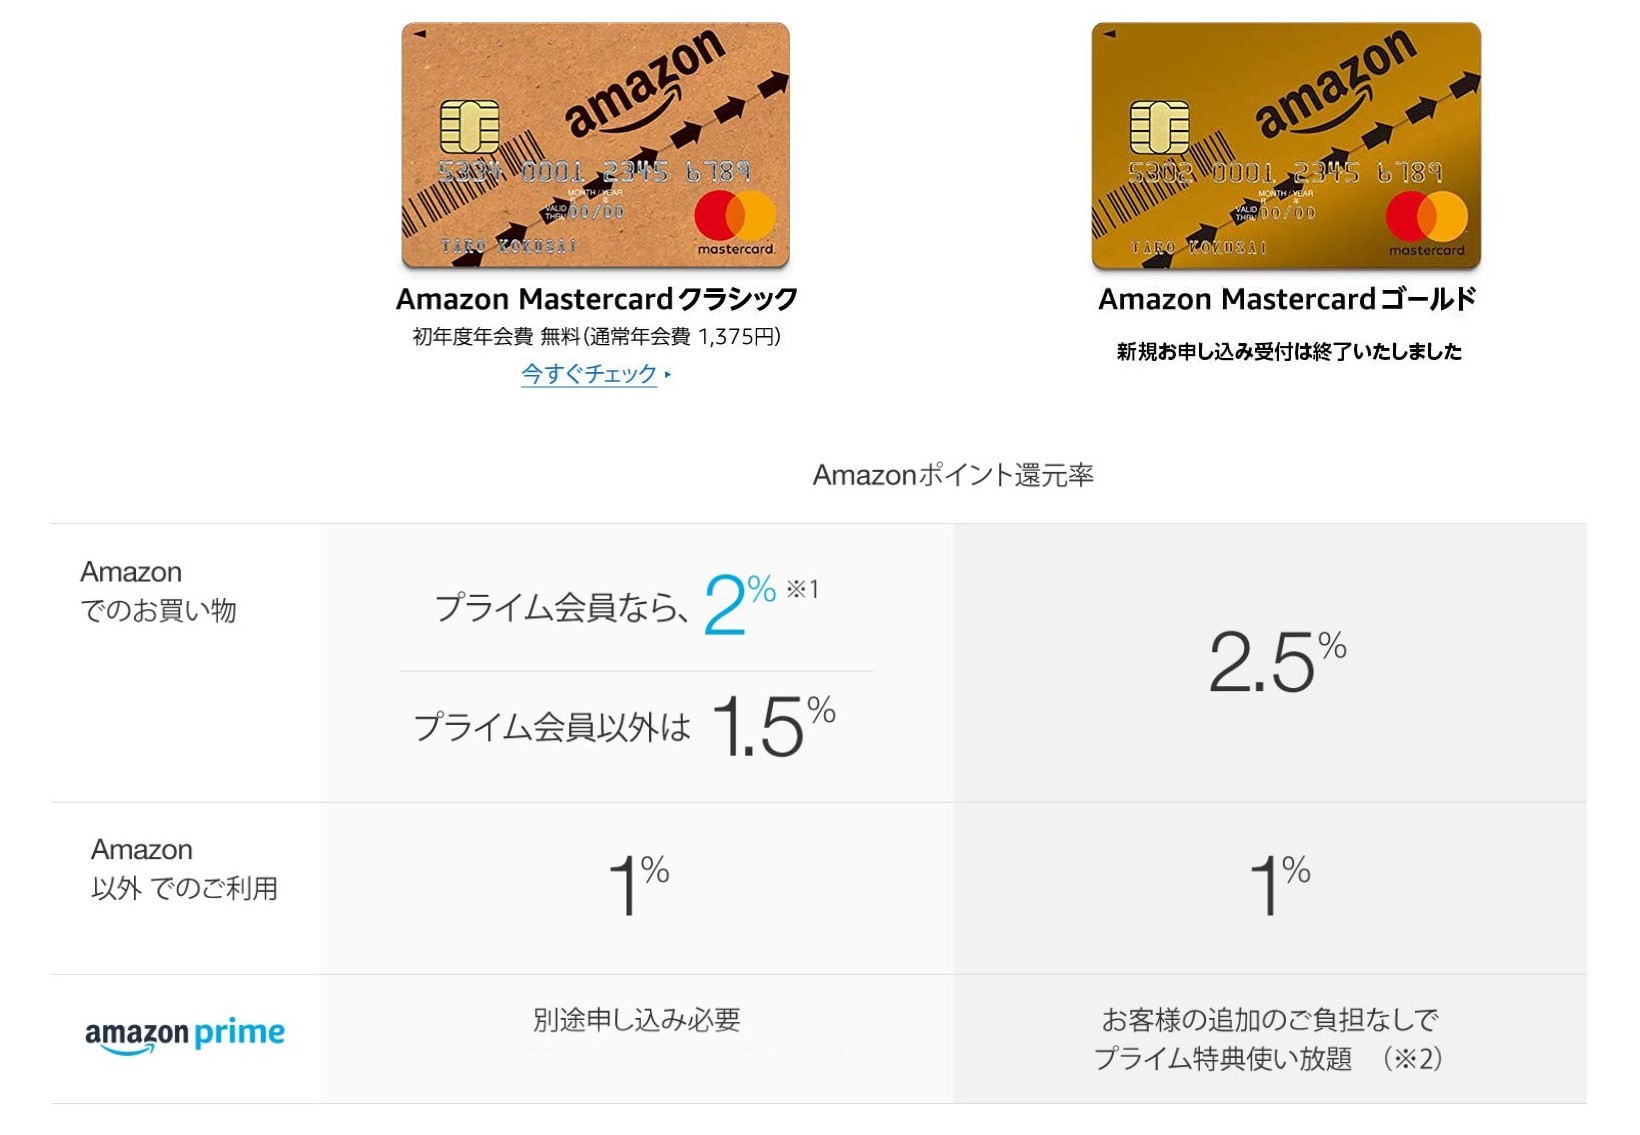 AmazonMastercardの還元ポイント詳細